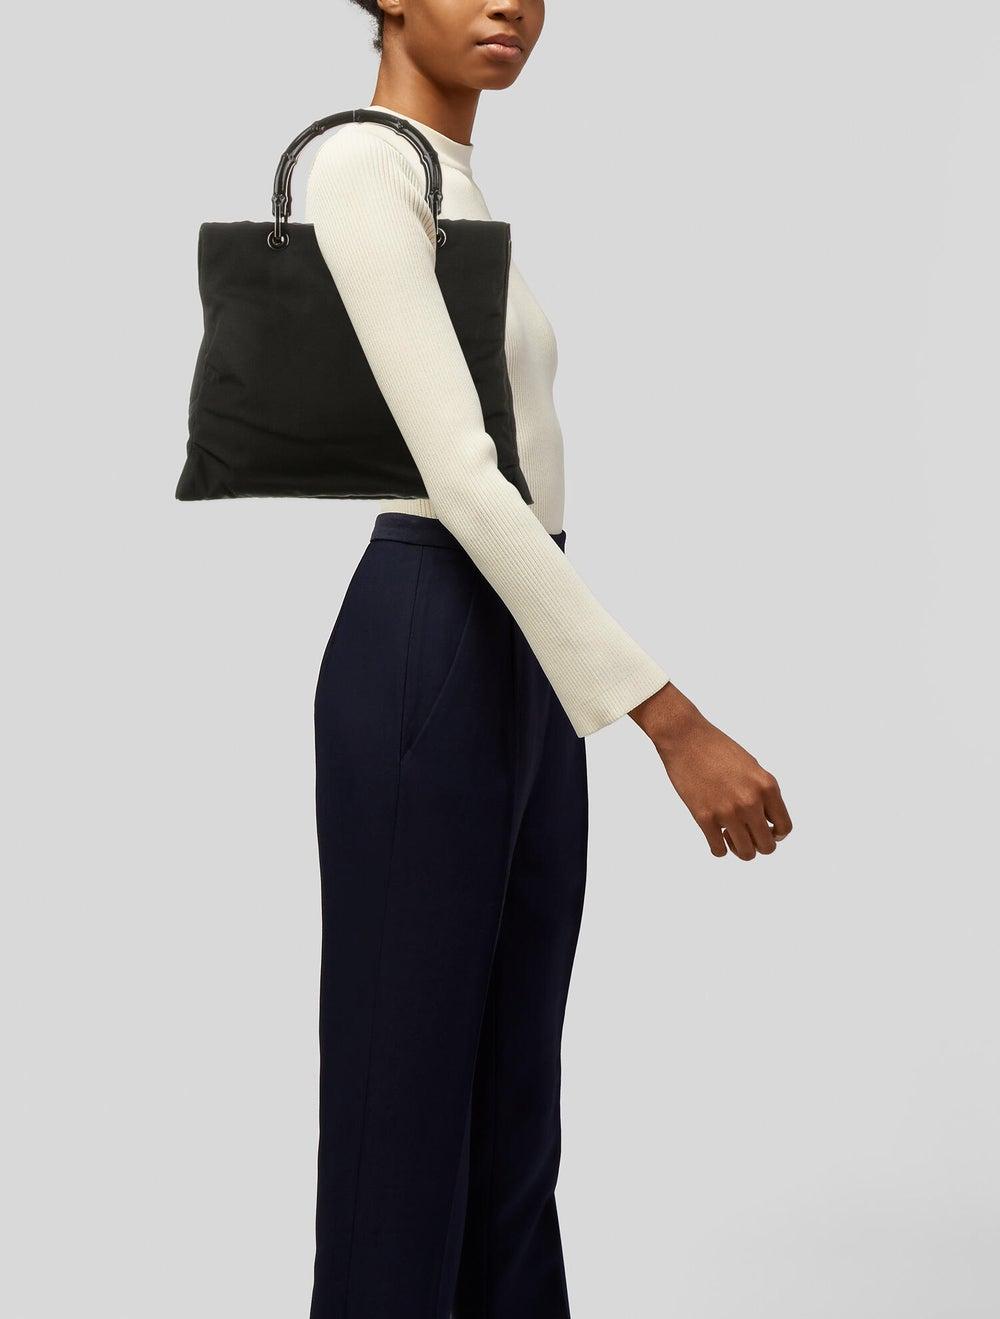 Gucci Nylon Bamboo Top Handle Bag Black - image 2